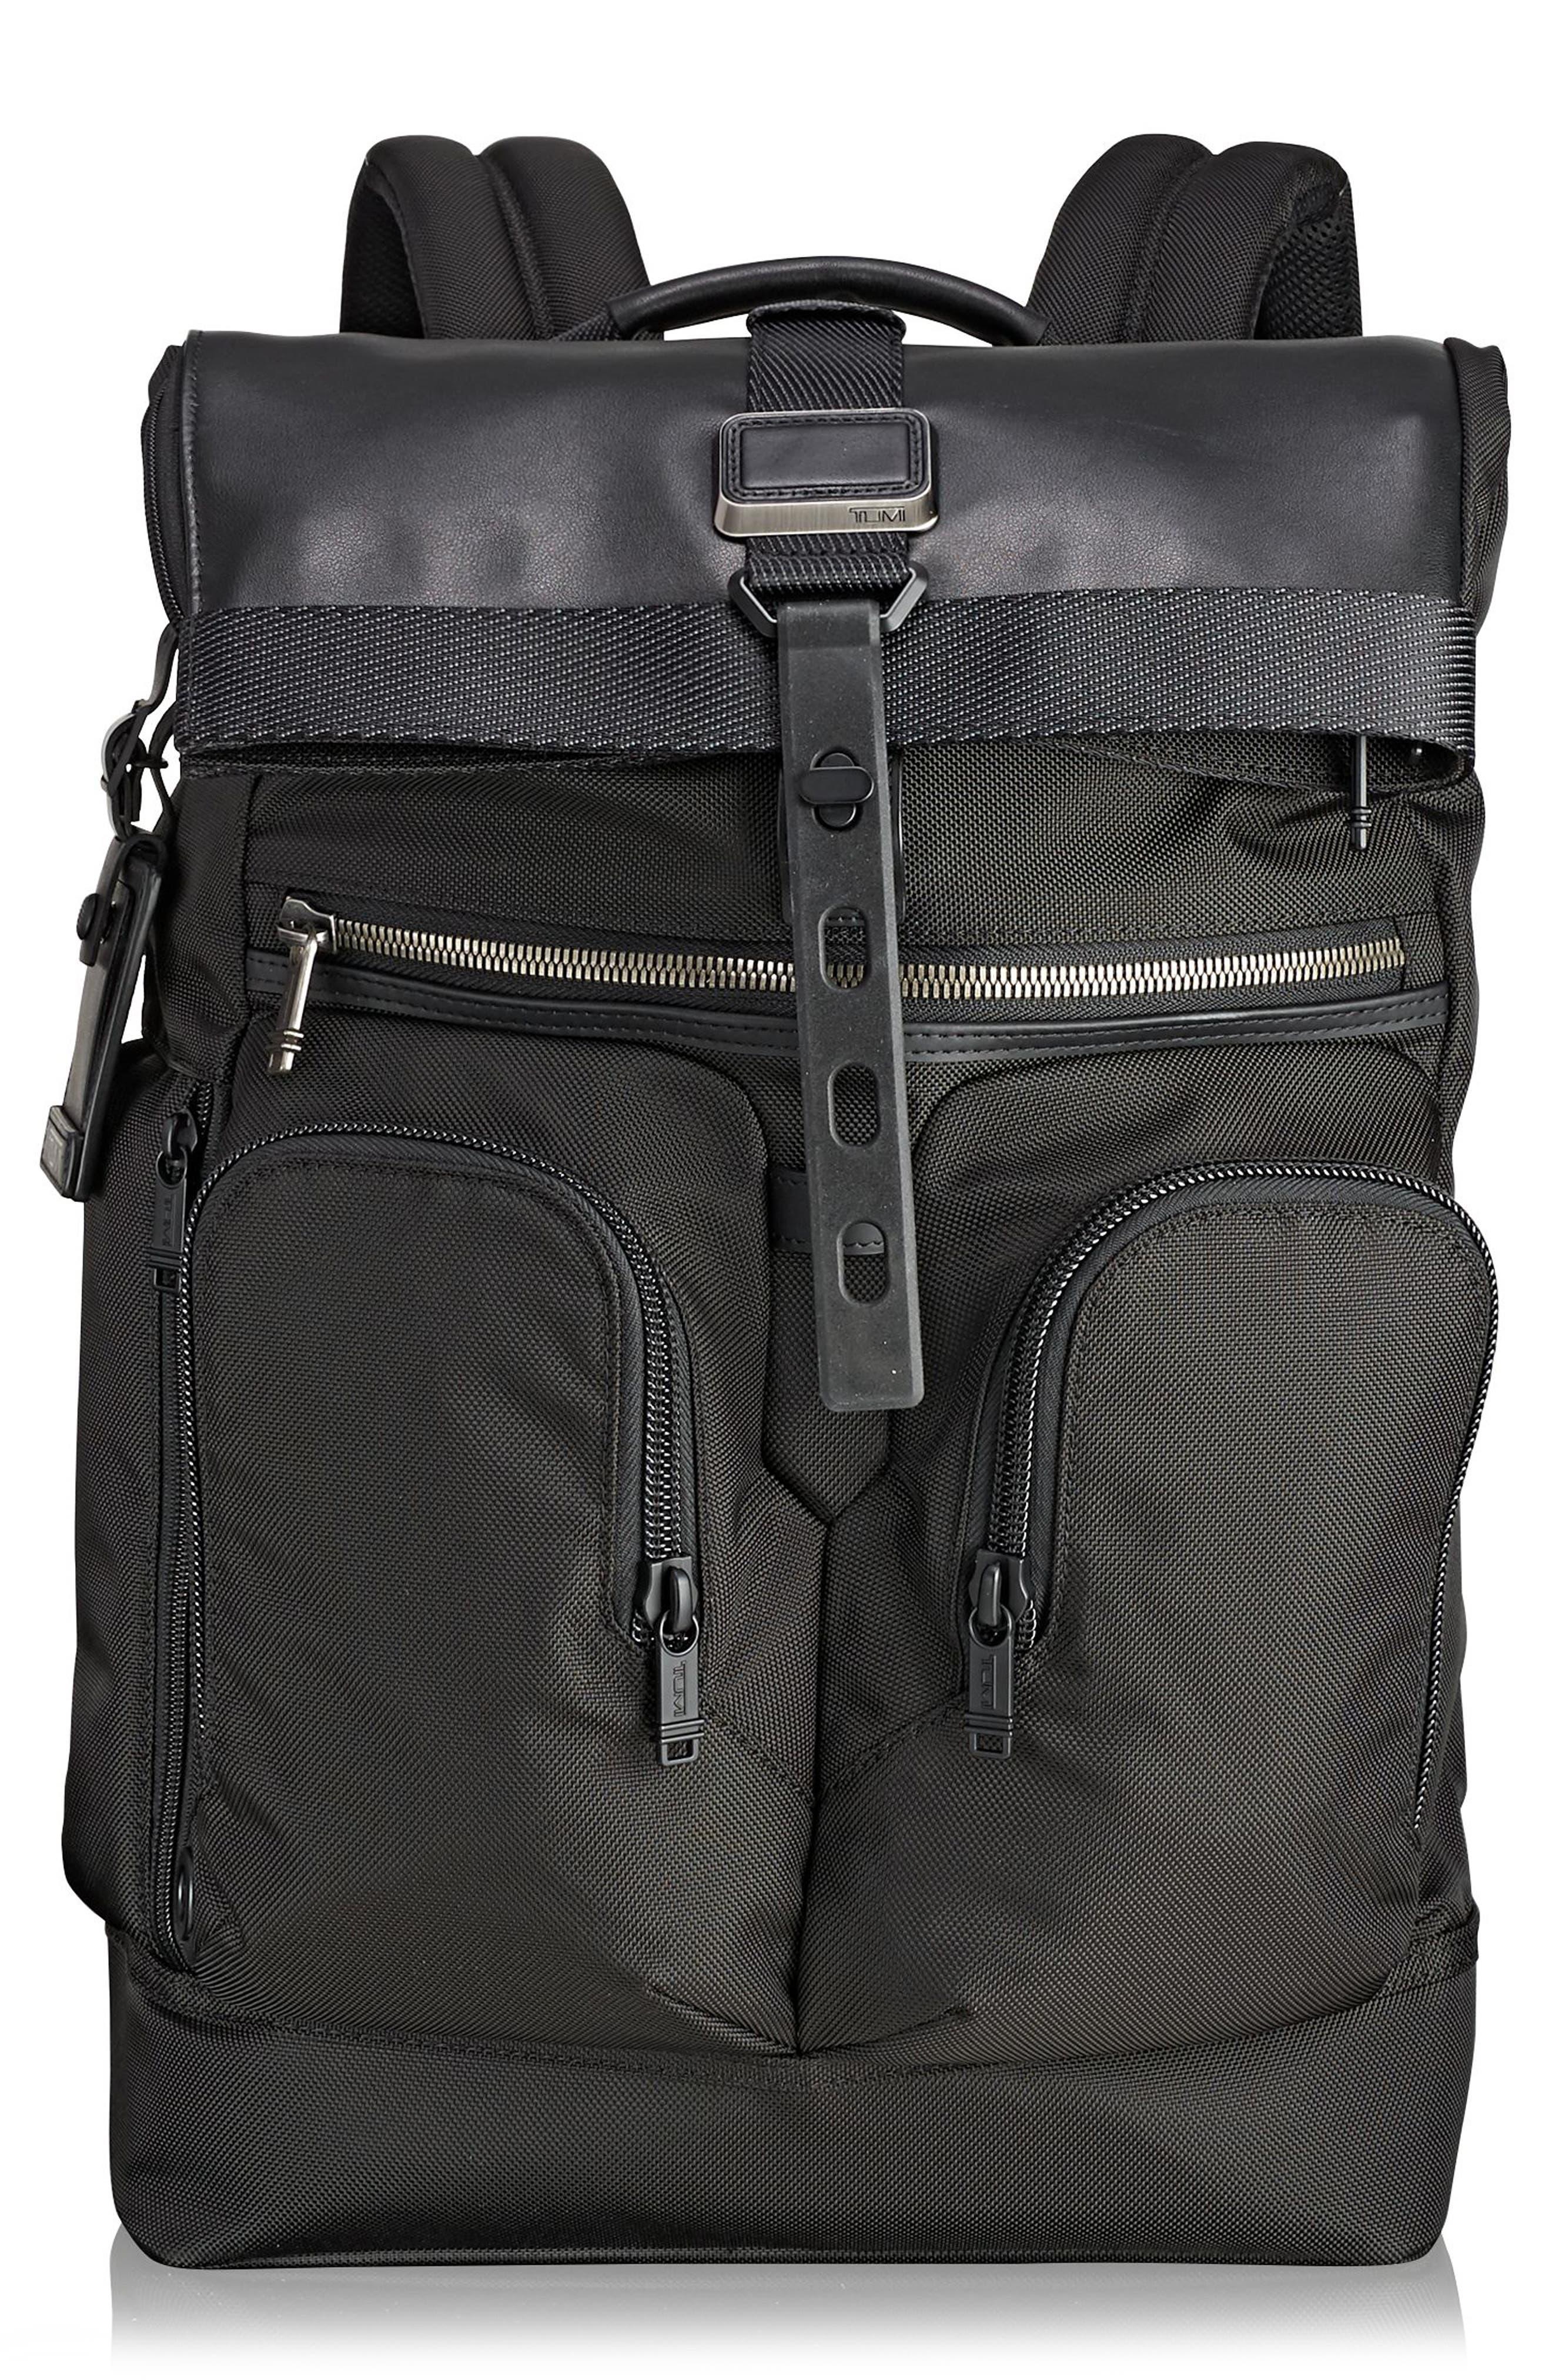 Alpha Bravo - London Backpack,                             Main thumbnail 1, color,                             BLACK